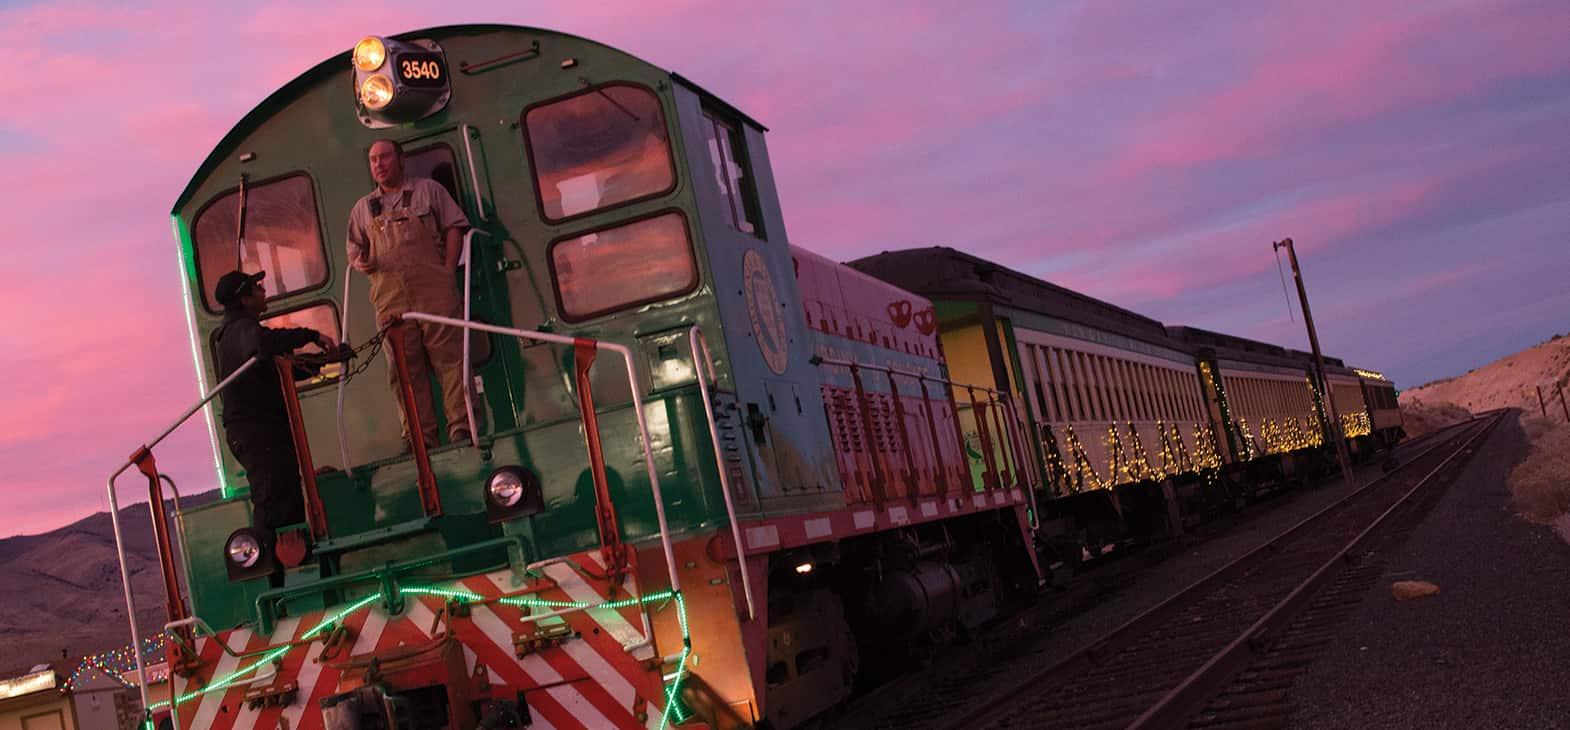 V&T Railway The Polar Express Train